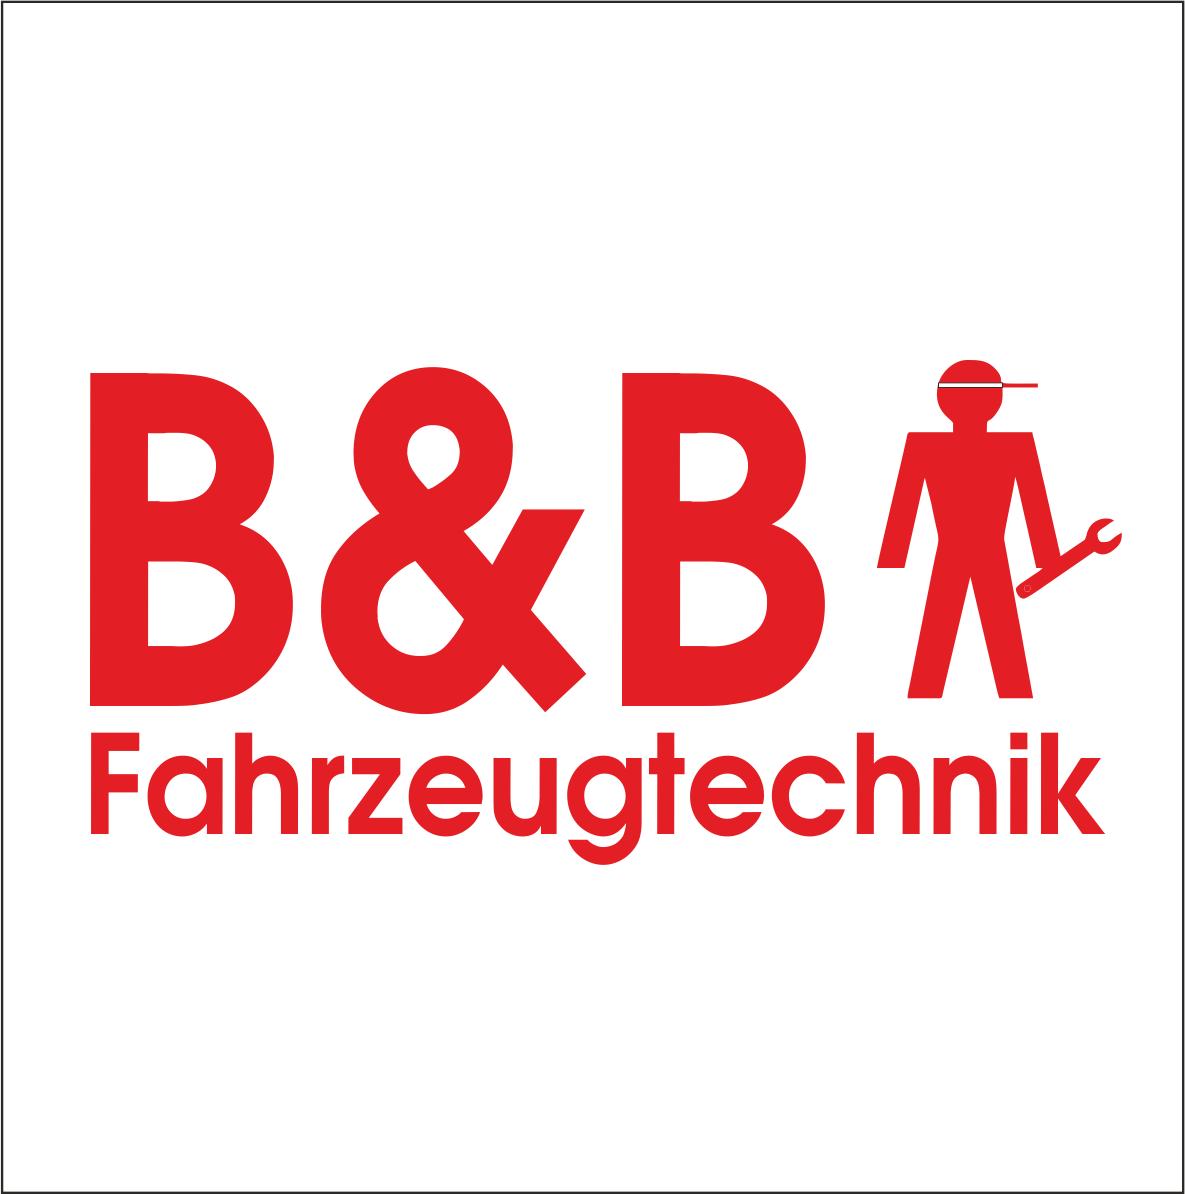 B&B Fahrzeugtechnik